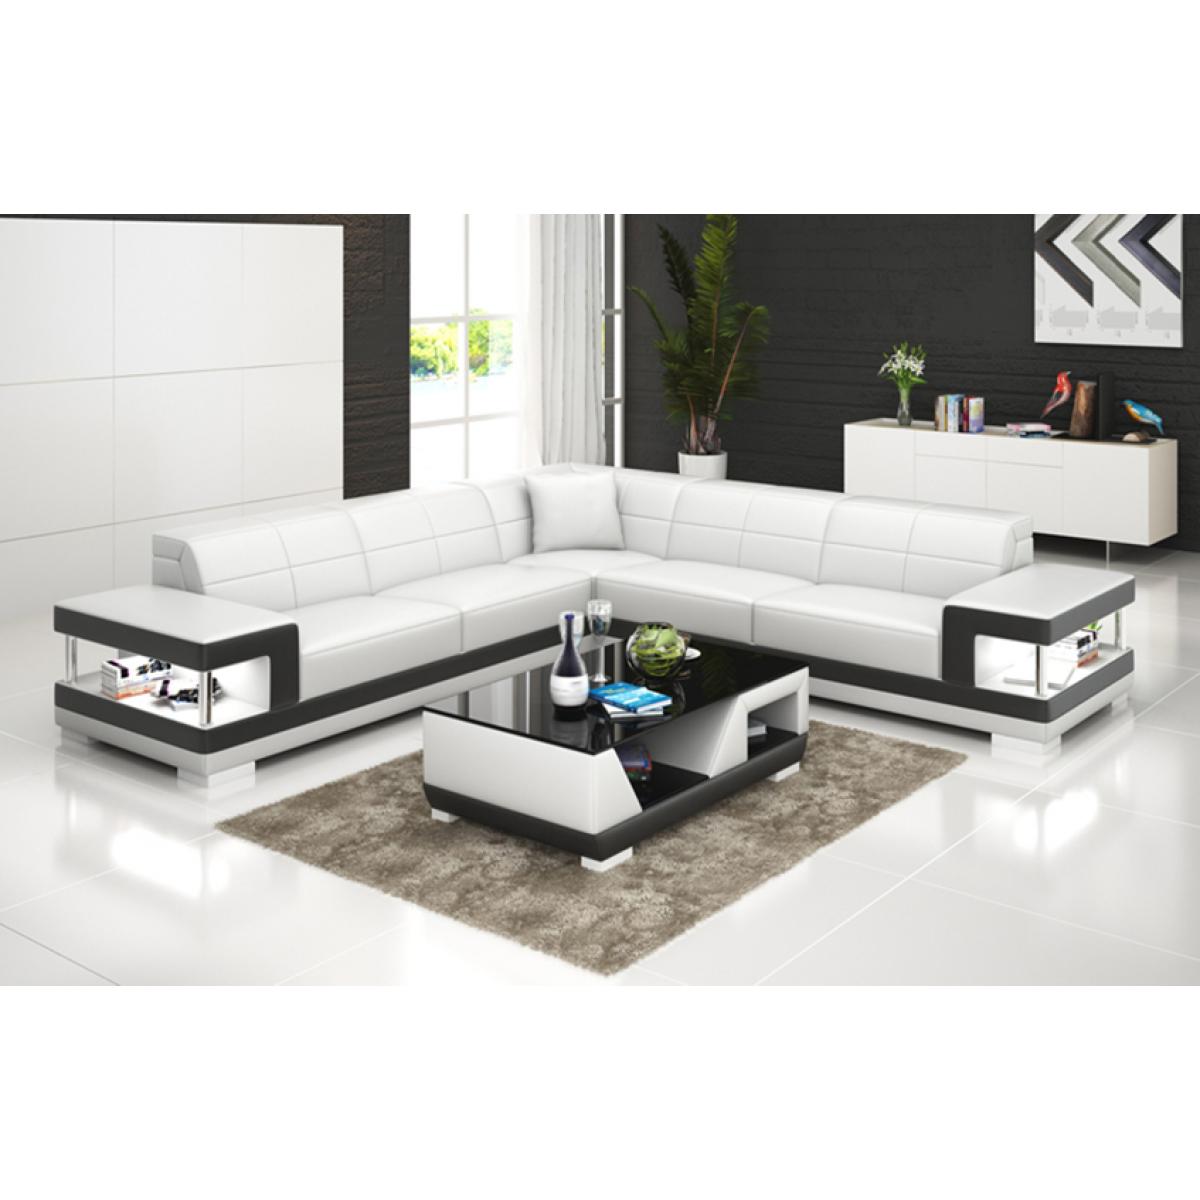 Grand canap d 39 angle en cuir lille avec clairage pop - Grand meuble d angle ...